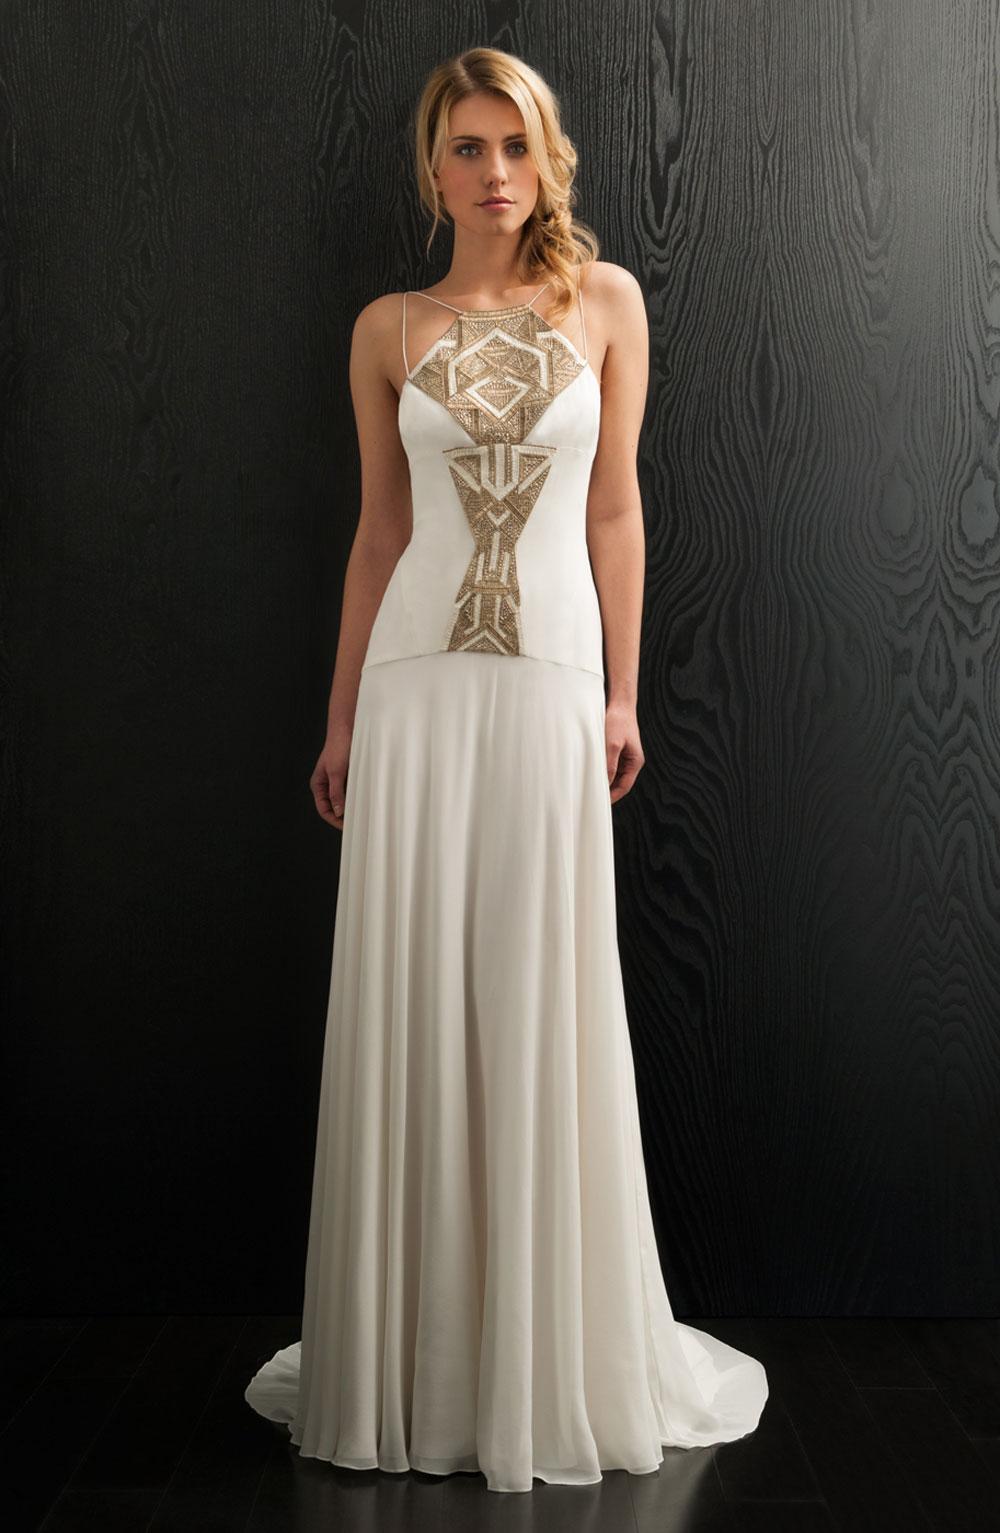 flattering wedding dresses photo - 1